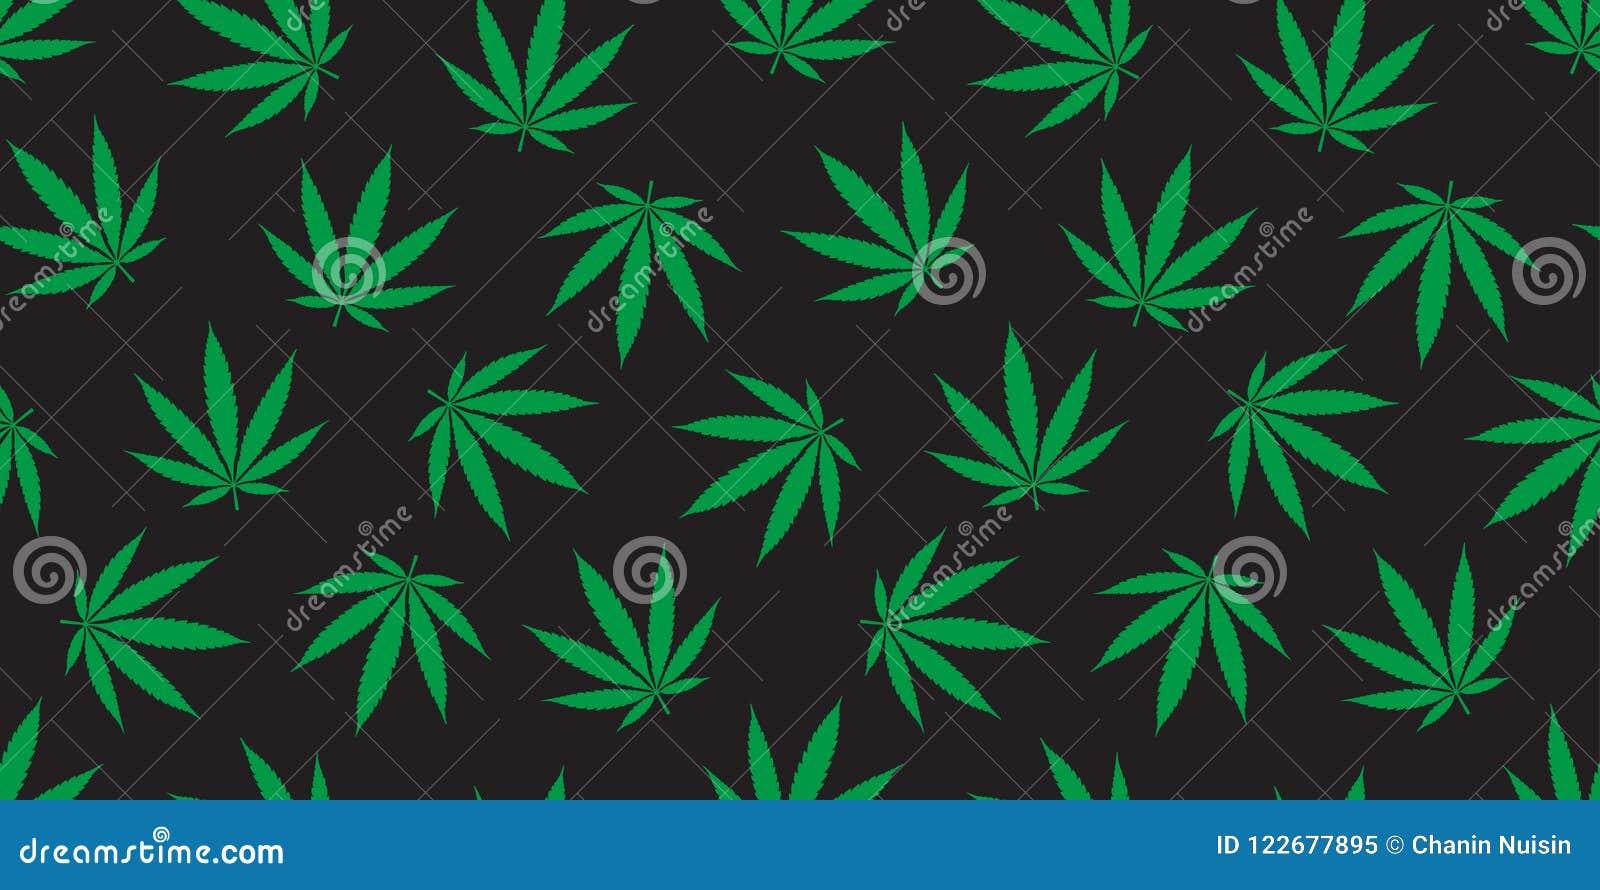 Weed Seamless Pattern Marijuana Cannabis Leaf Wallpaper